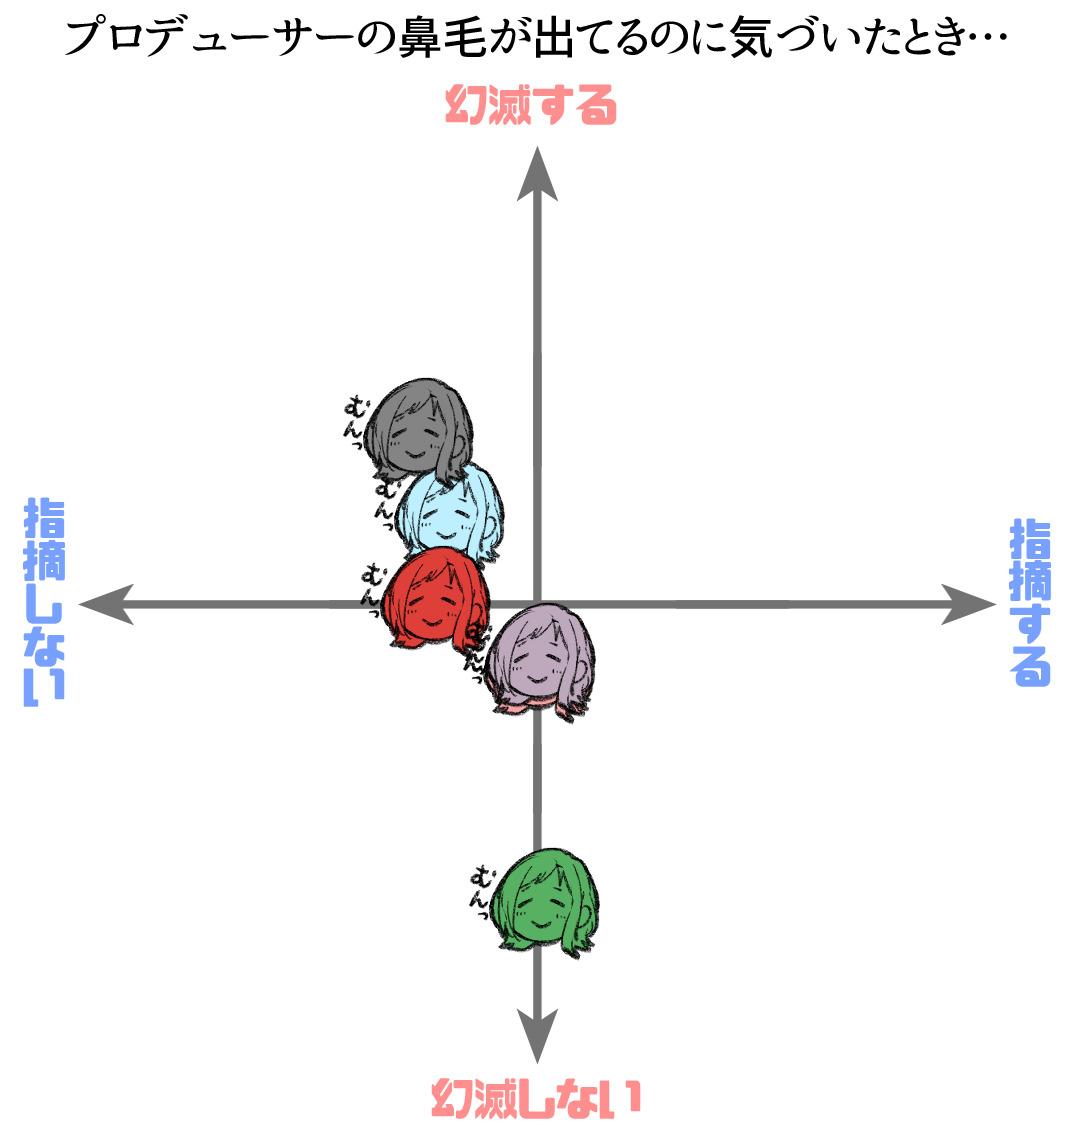 f:id:hoshi_sano:20200414111315j:image:w400